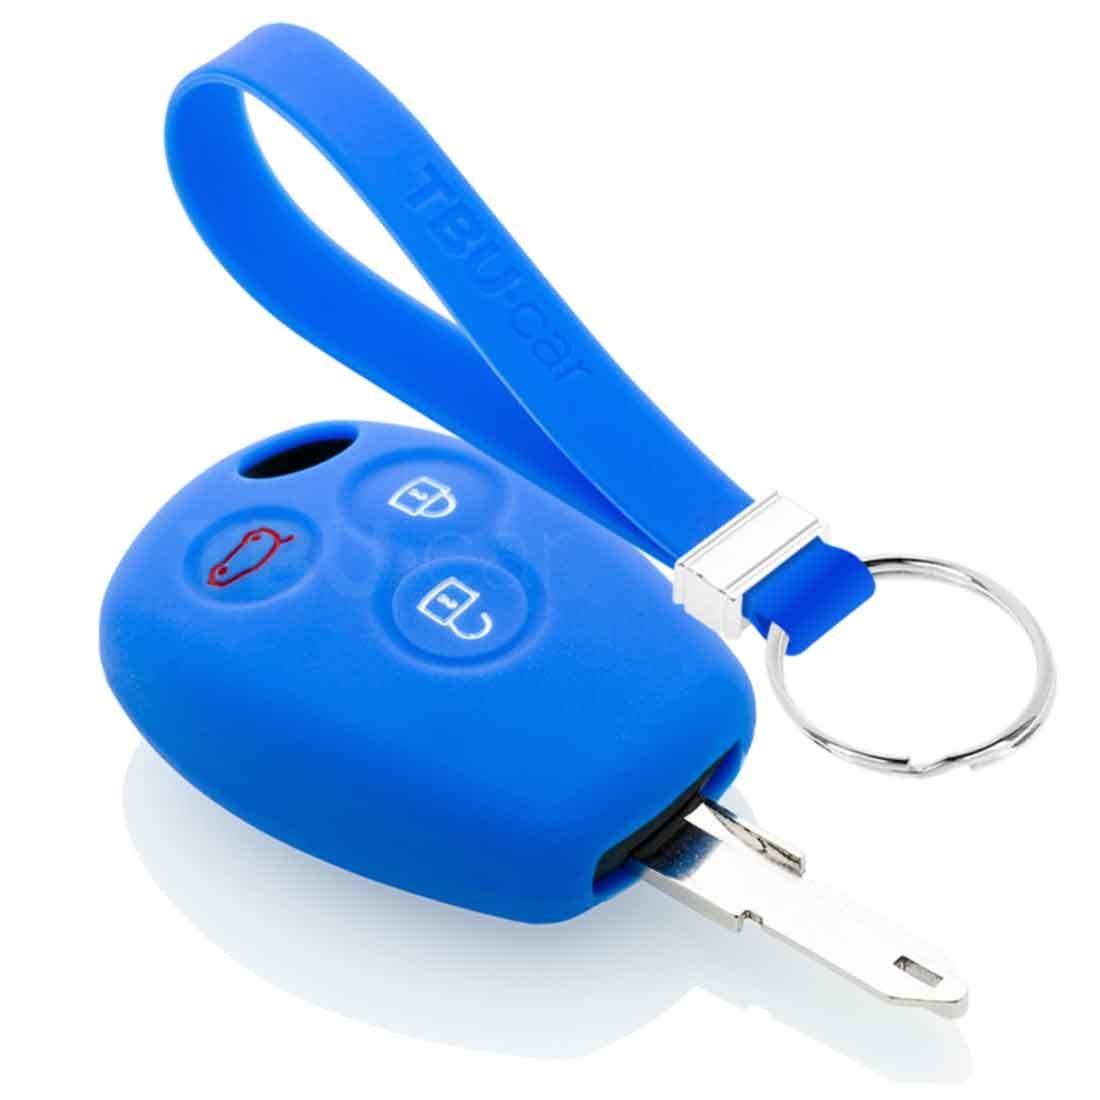 TBU car TBU car Sleutel cover compatibel met Dacia - Silicone sleutelhoesje - beschermhoesje autosleutel - Blauw